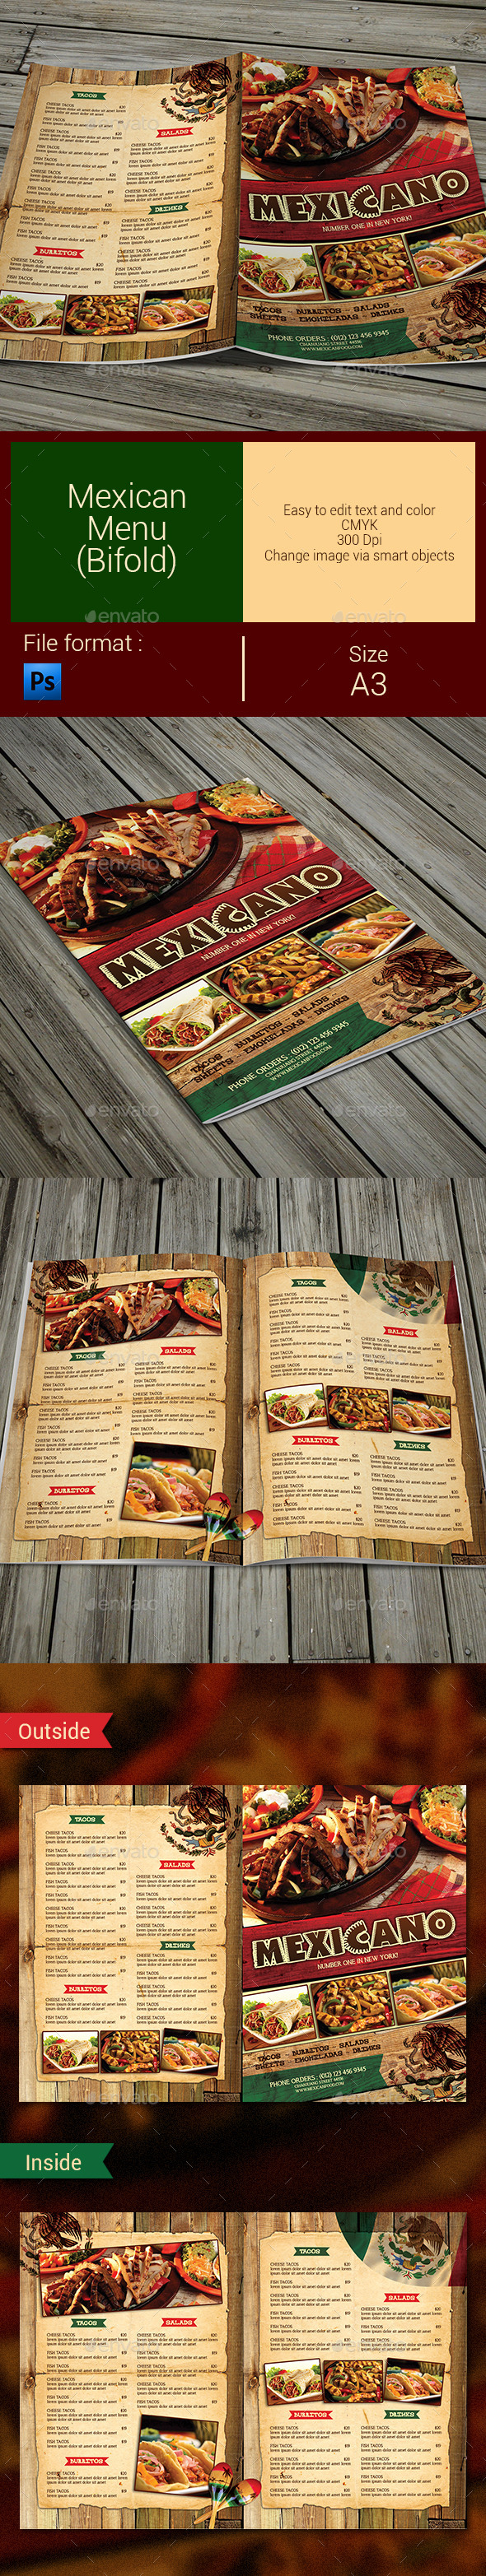 Mexican Menu (Bifold) - Food Menus Print Templates